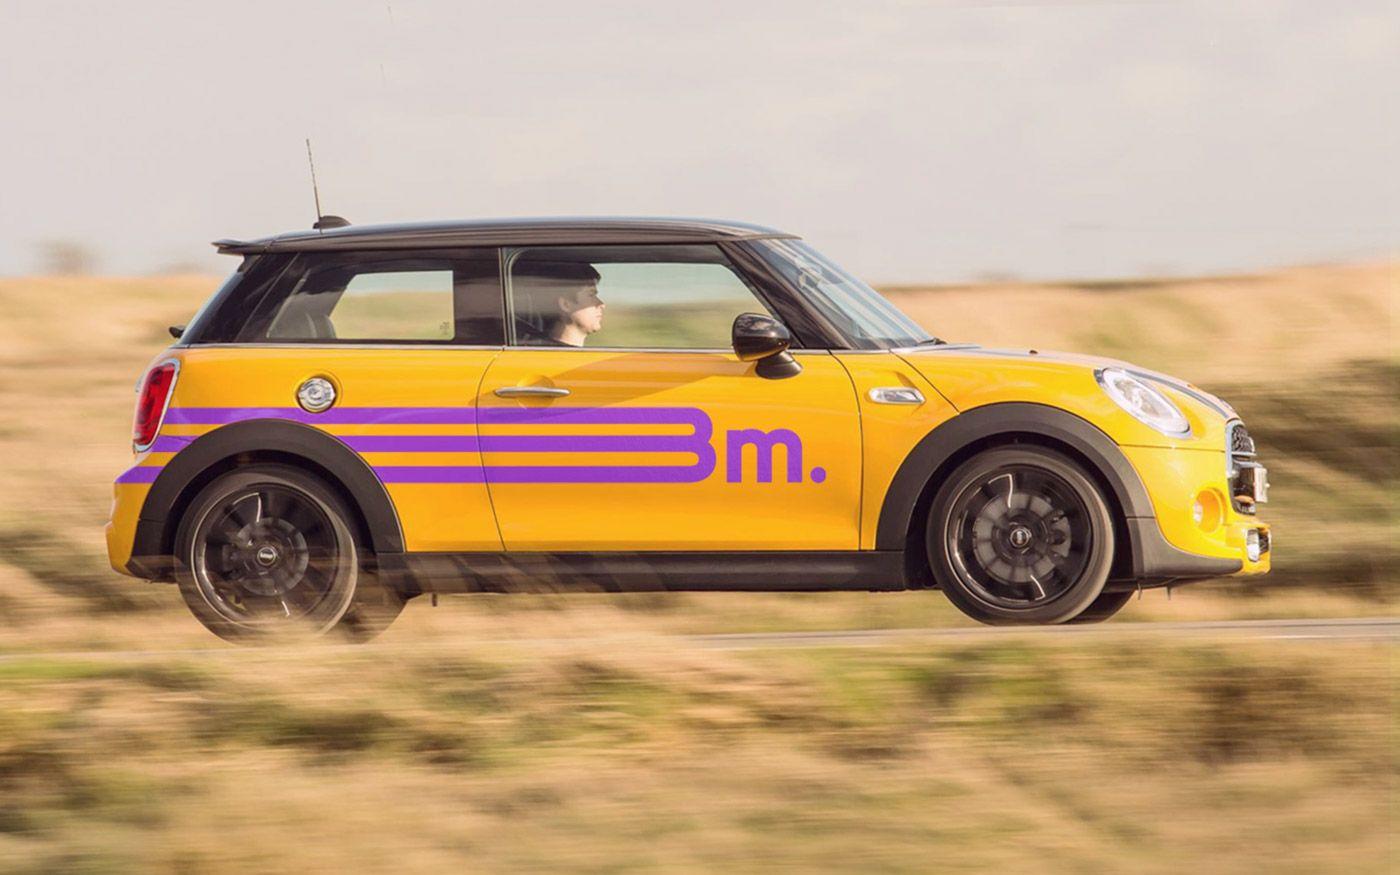 Big machine on behance advertising services marketing